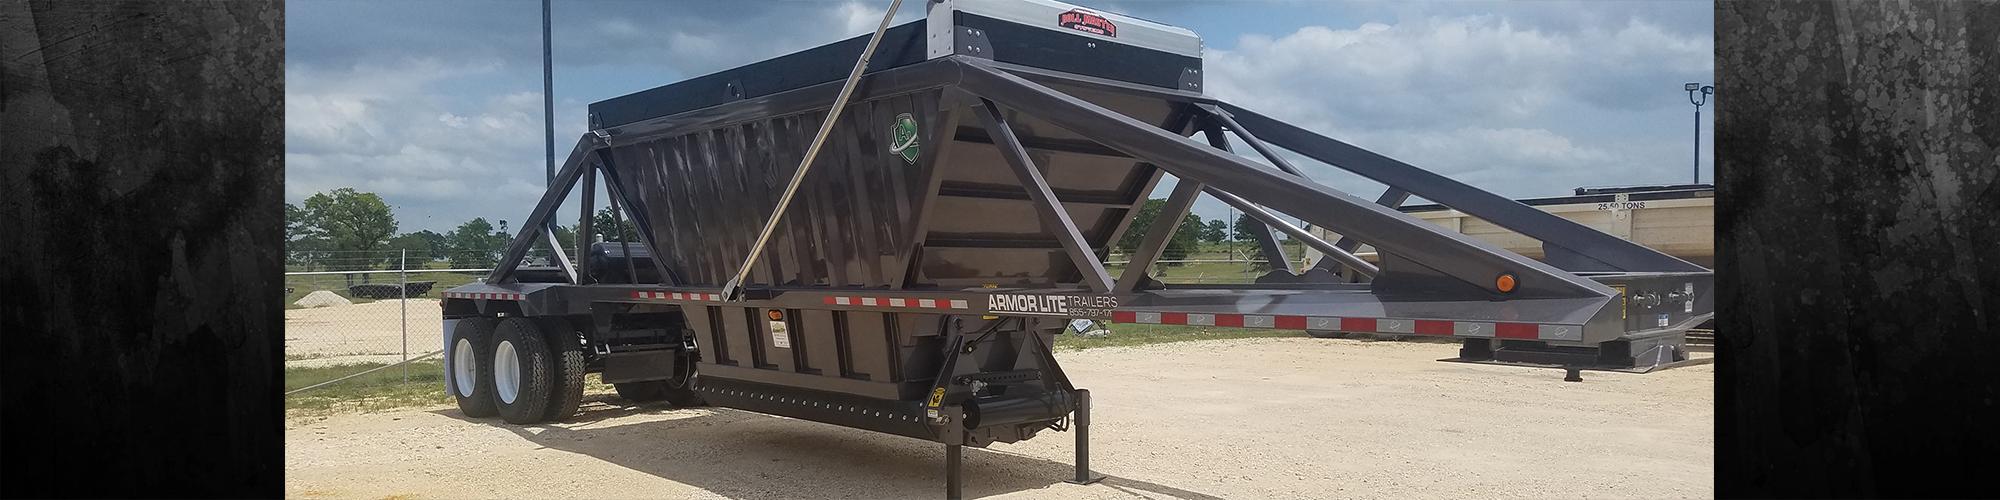 alamo city trailer sales, llc  Ww Stock Trailer Wiring Harness For Trailer Lights #17